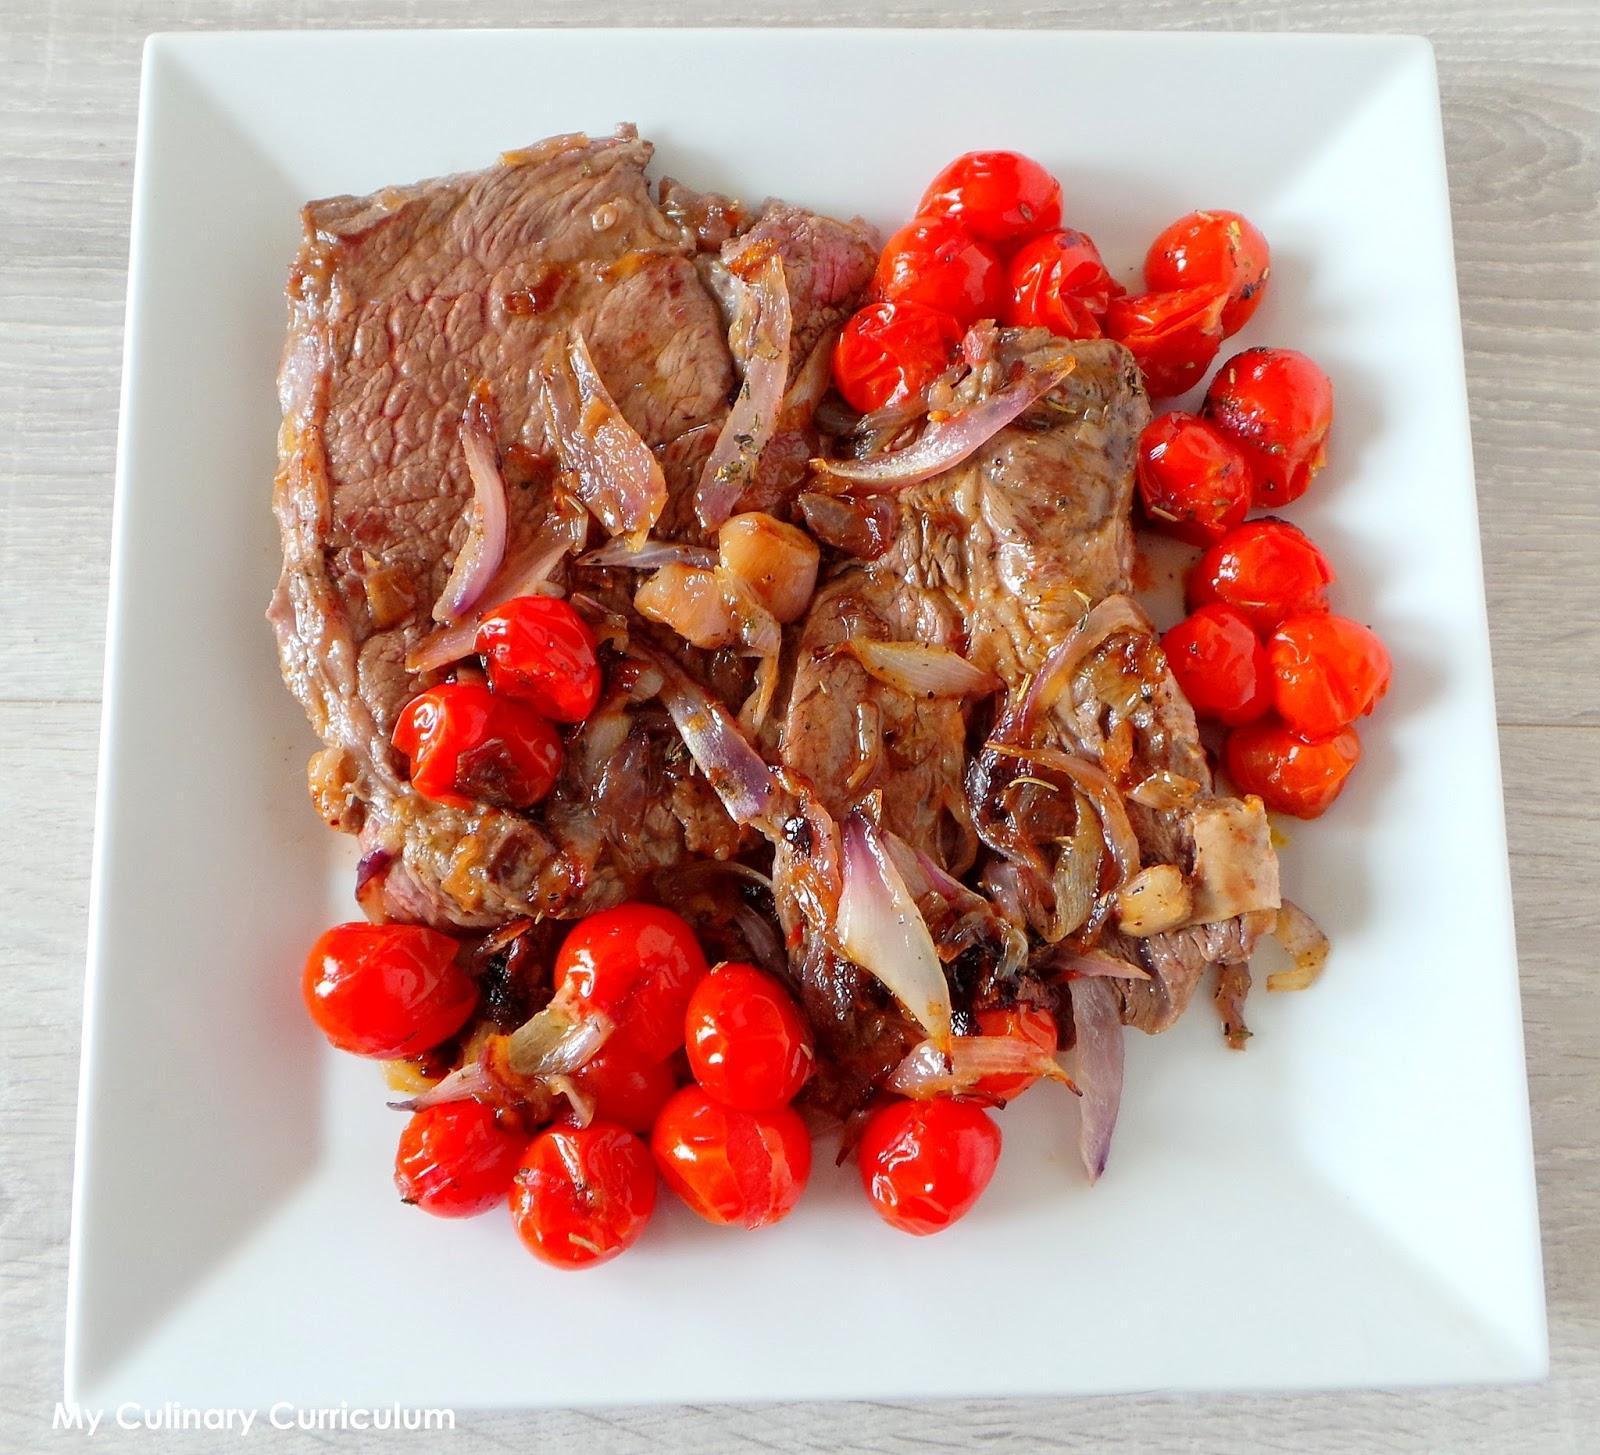 My culinary curriculum basse c te de b uf aux oignons - Cuisiner basse cote de boeuf ...